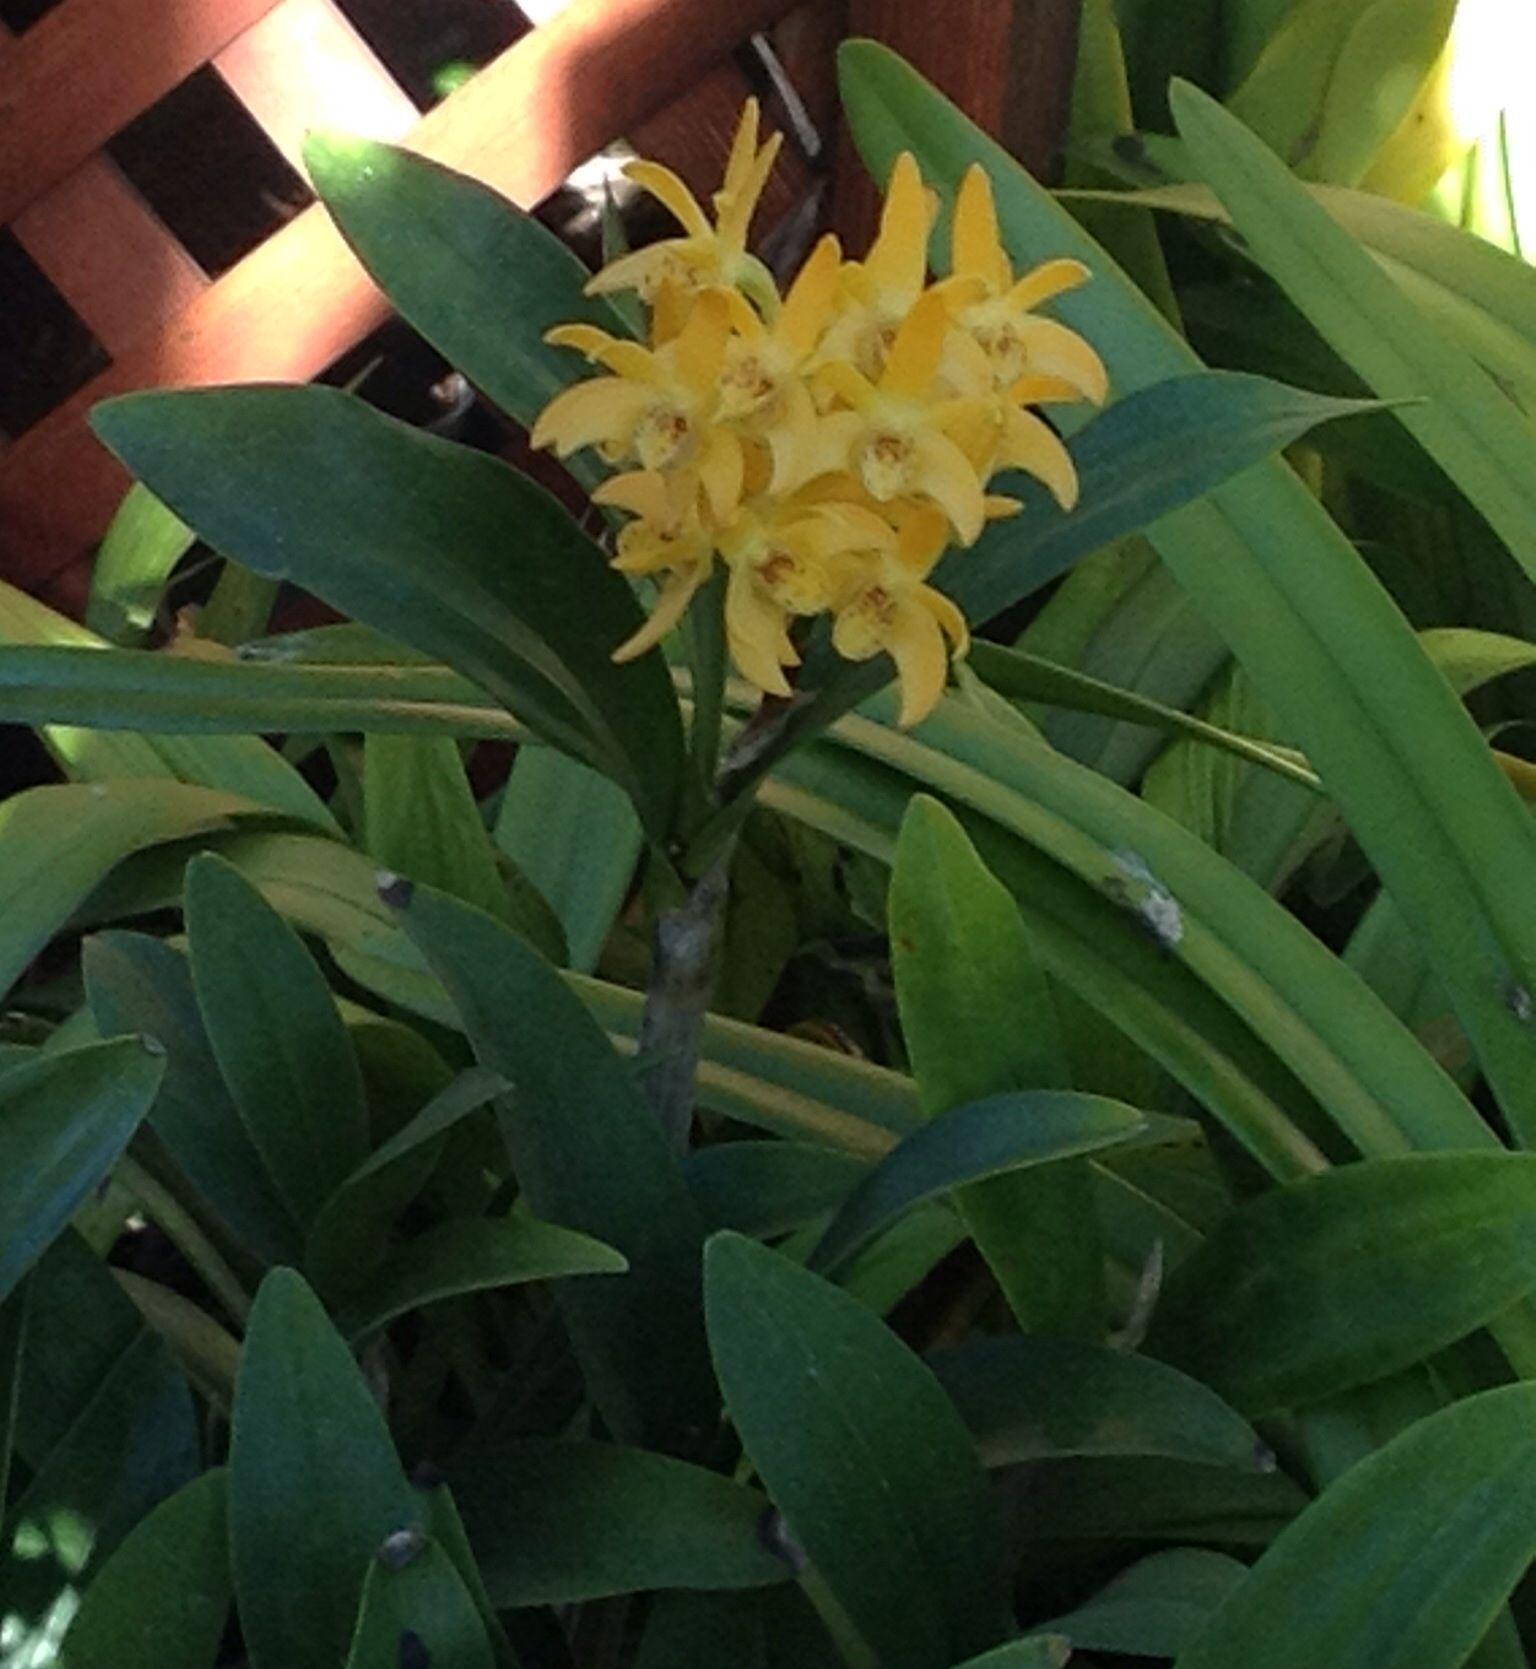 Dendrobium gilliestone australian orchid hybrid fabulous color